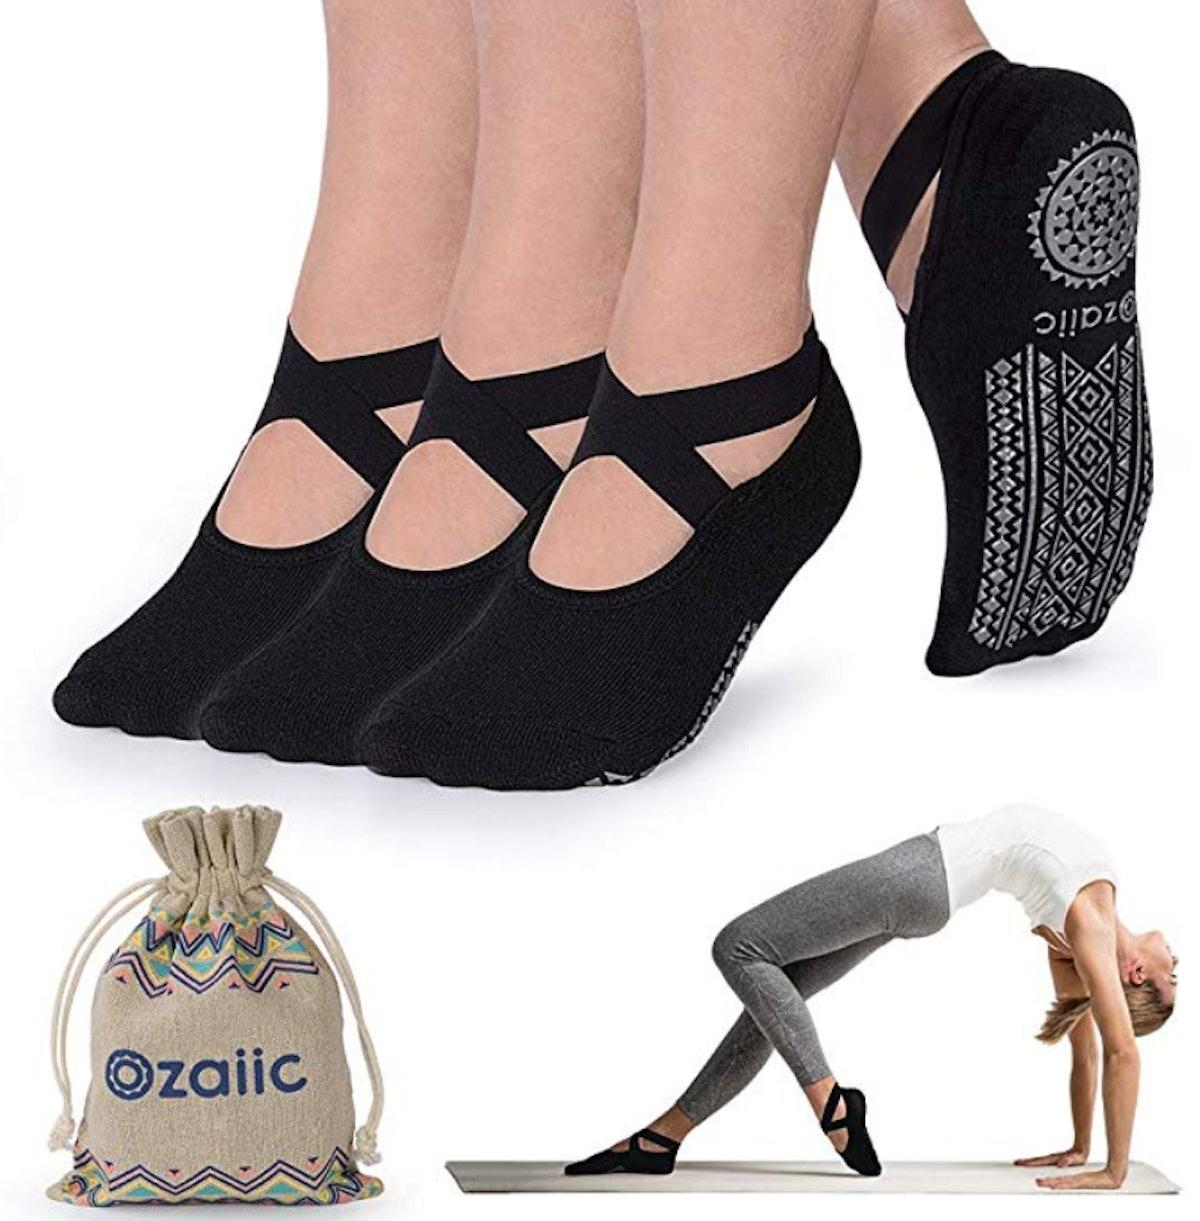 Ozaiic Yoga Socks (3-Pack)